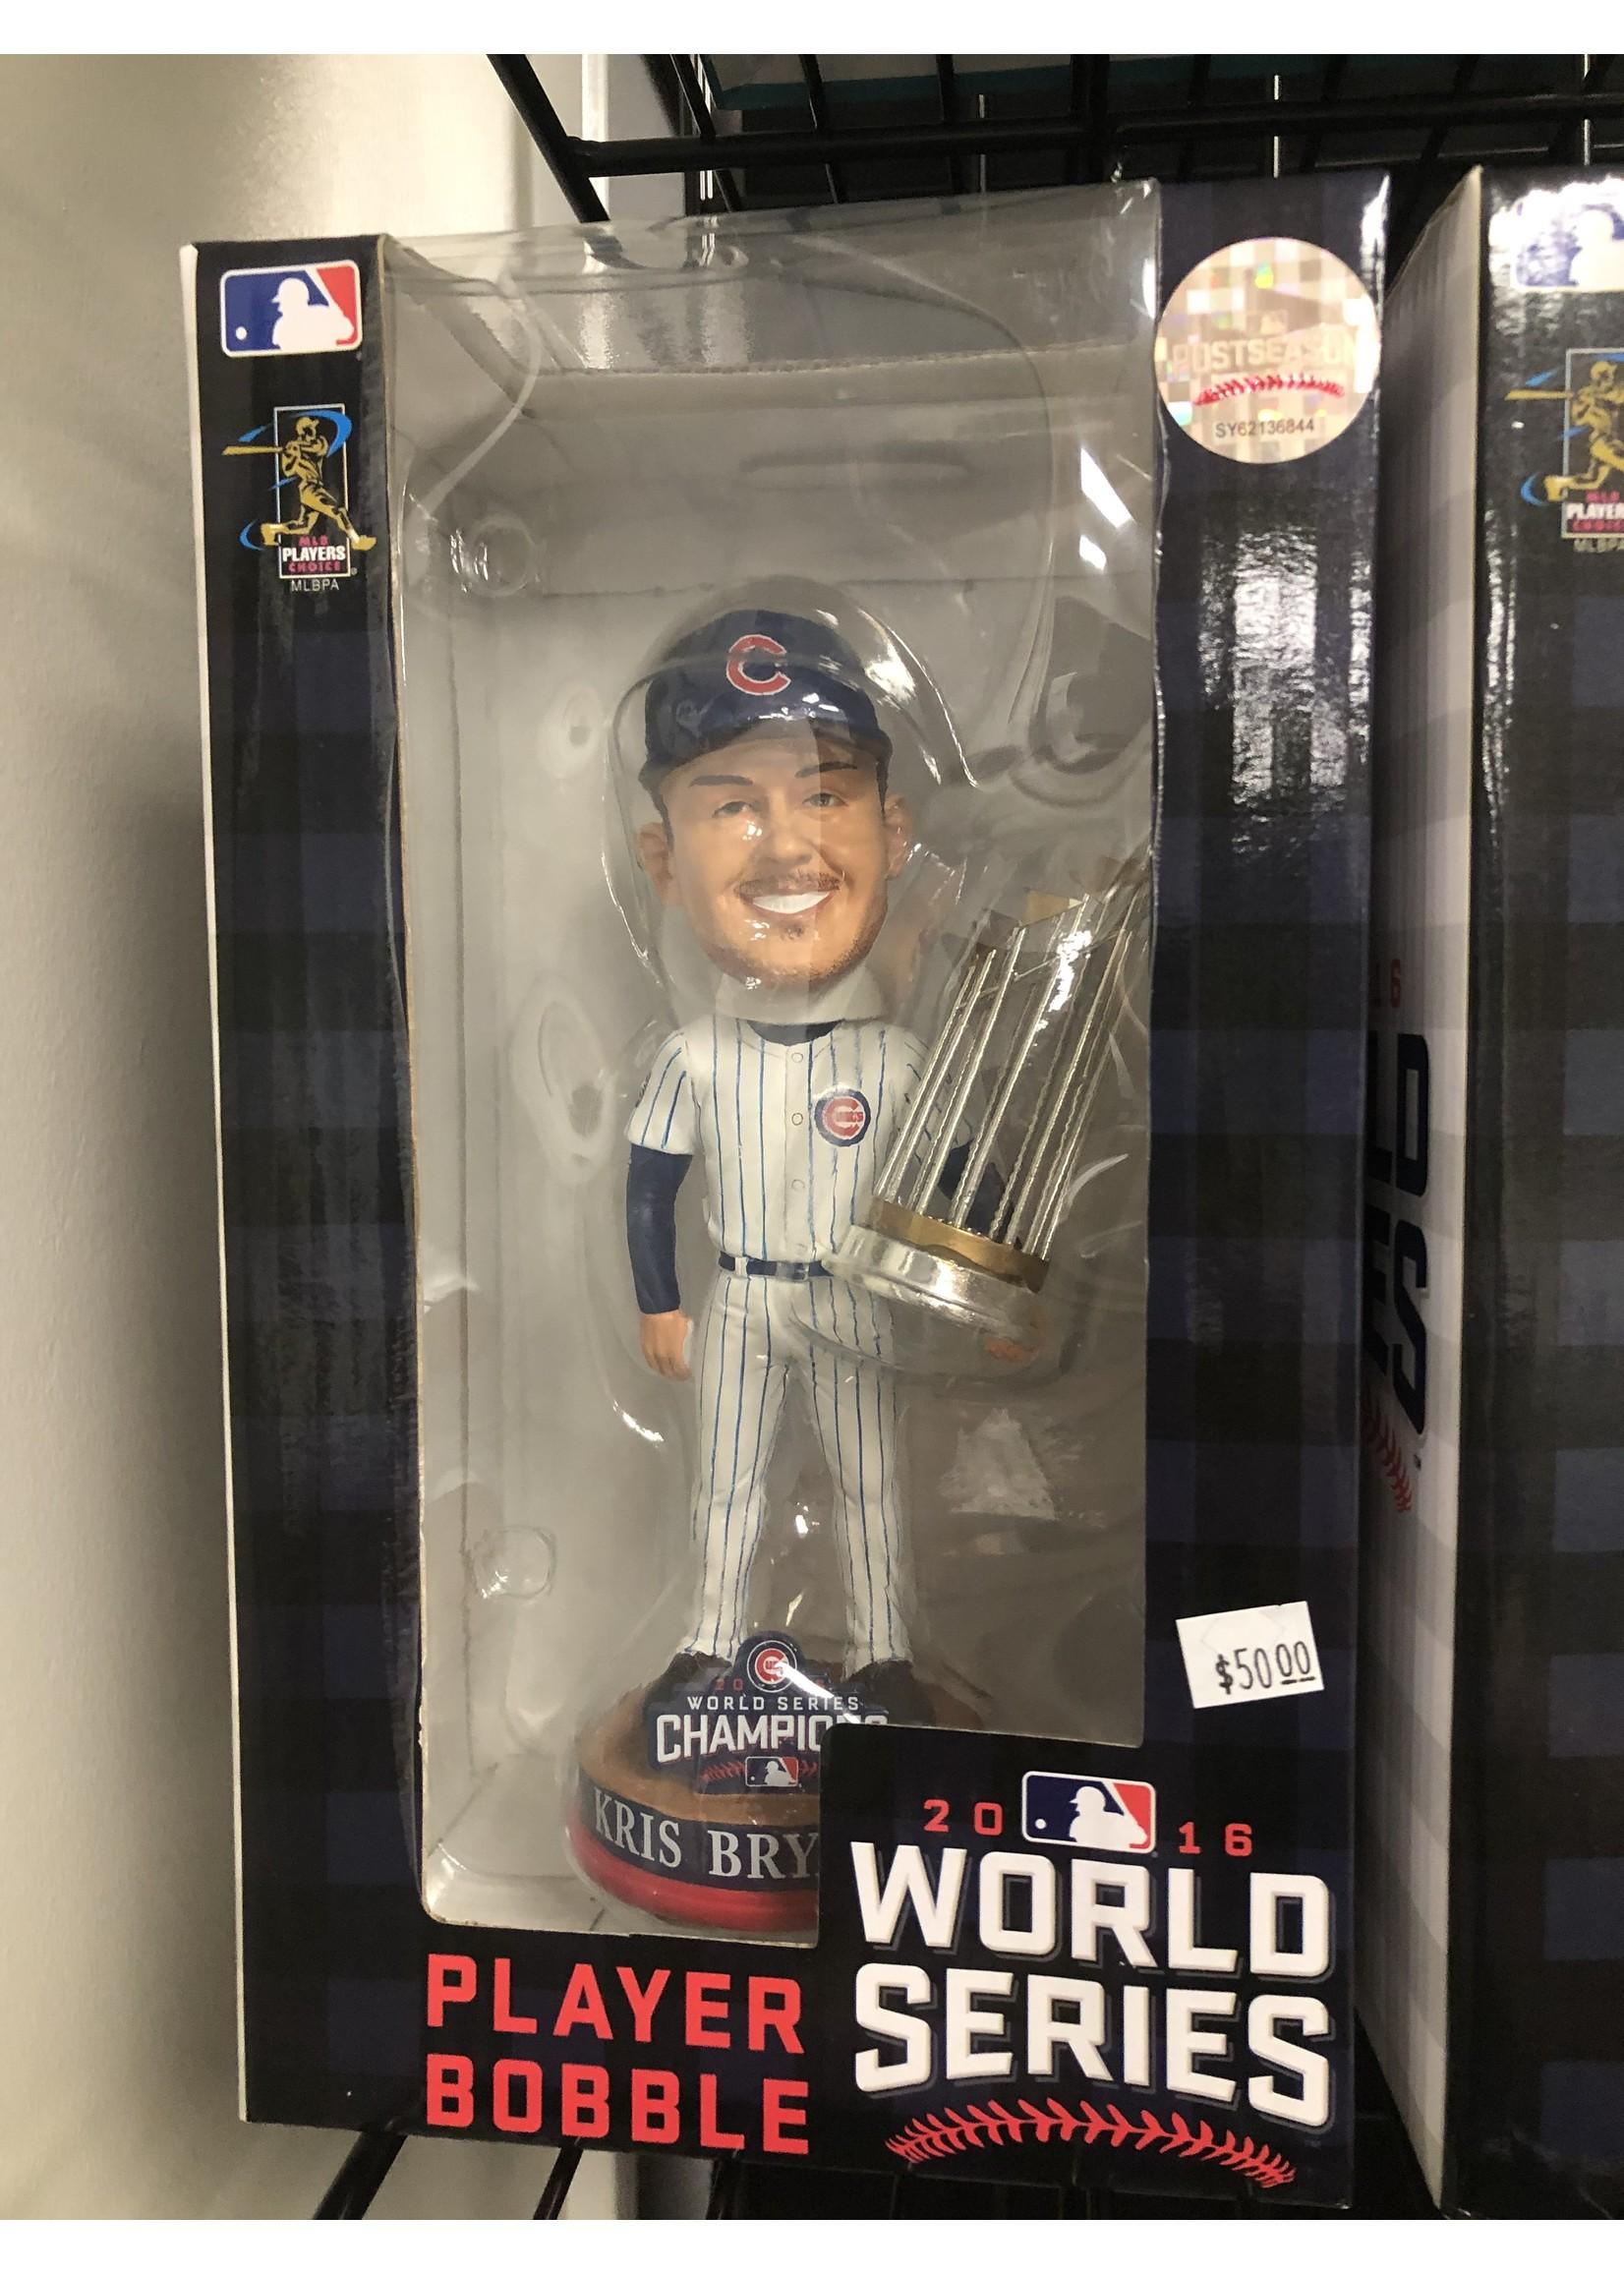 2016 World Series Bobble Player - Kris Bryant